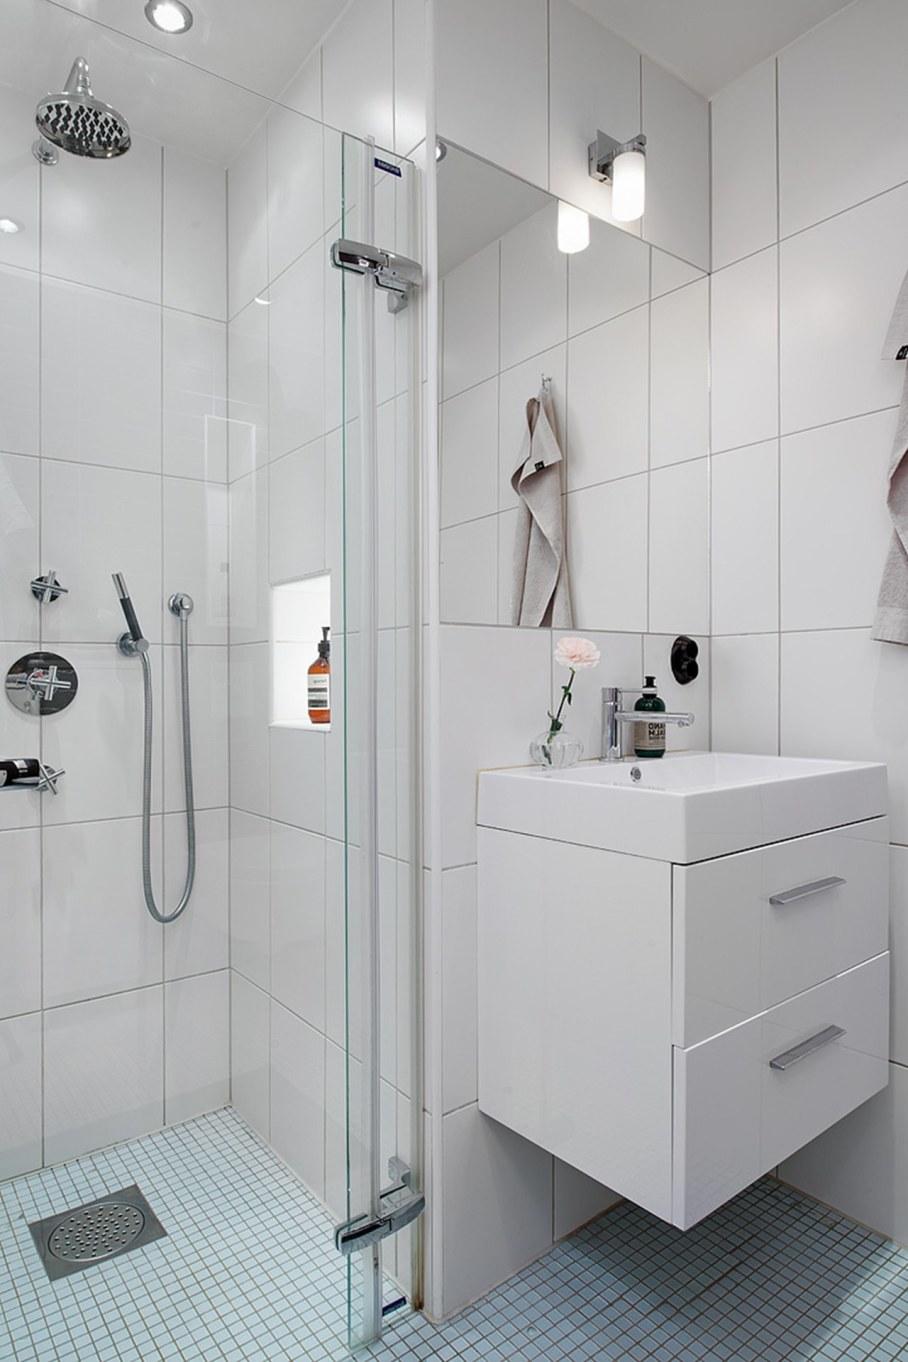 Scandinavian style interior design - bathroom